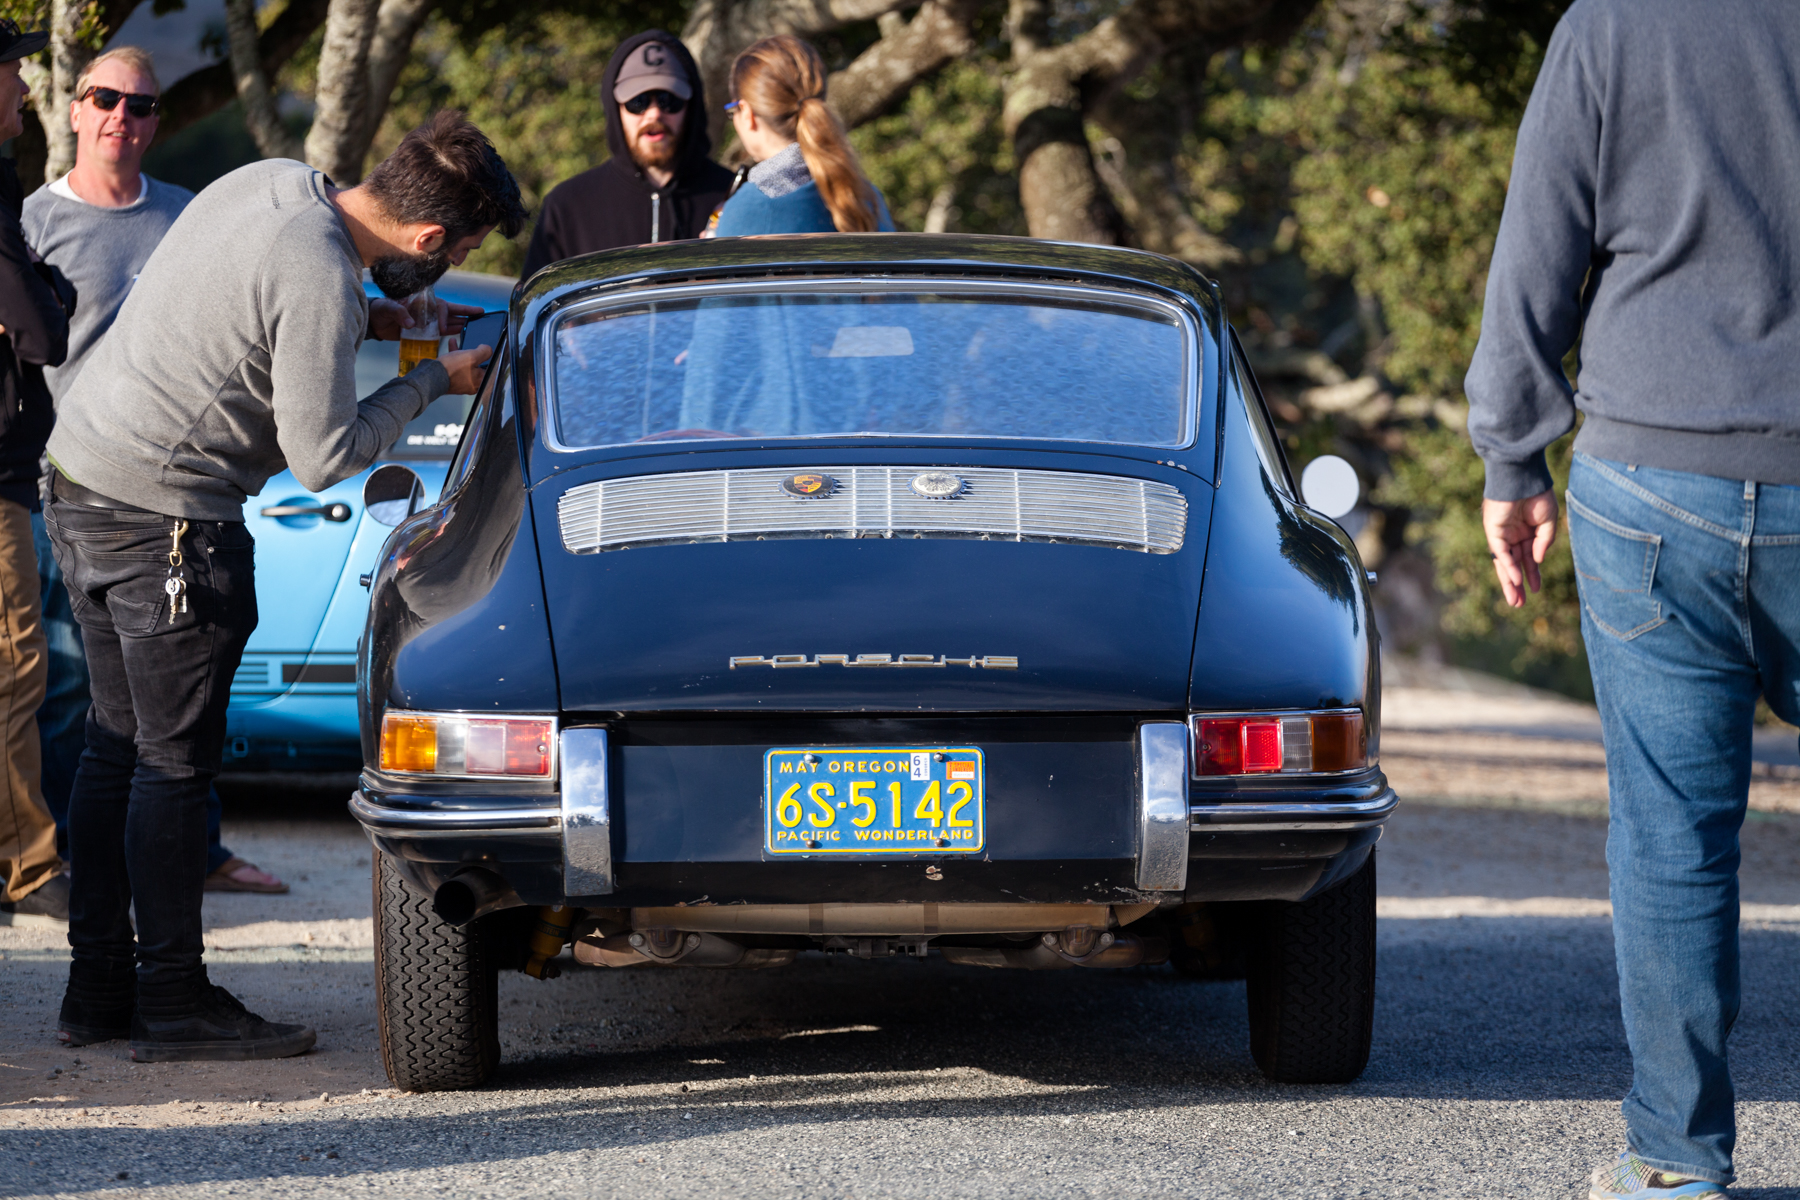 Cam Healy's 1964 Porsche 911 (127th 911 made)